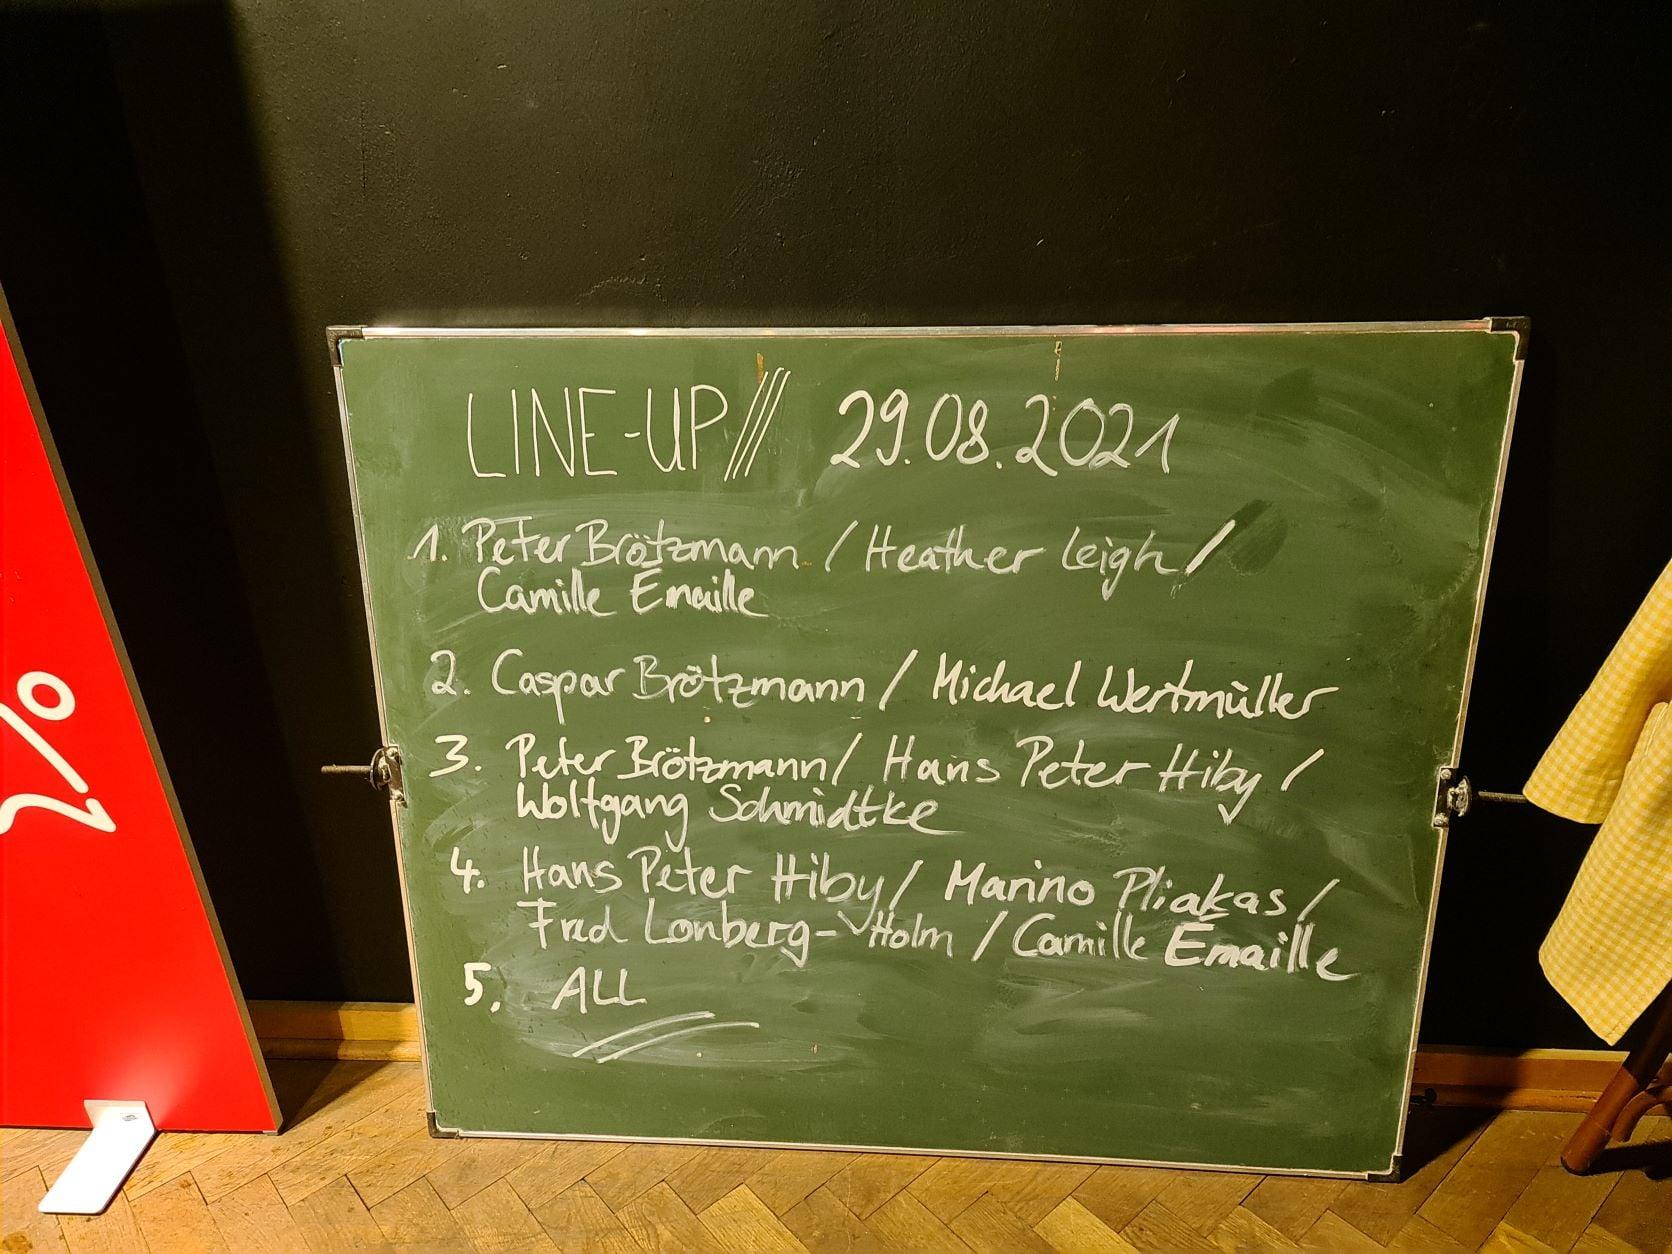 BRÖtz 80! Festival 29.08.2021